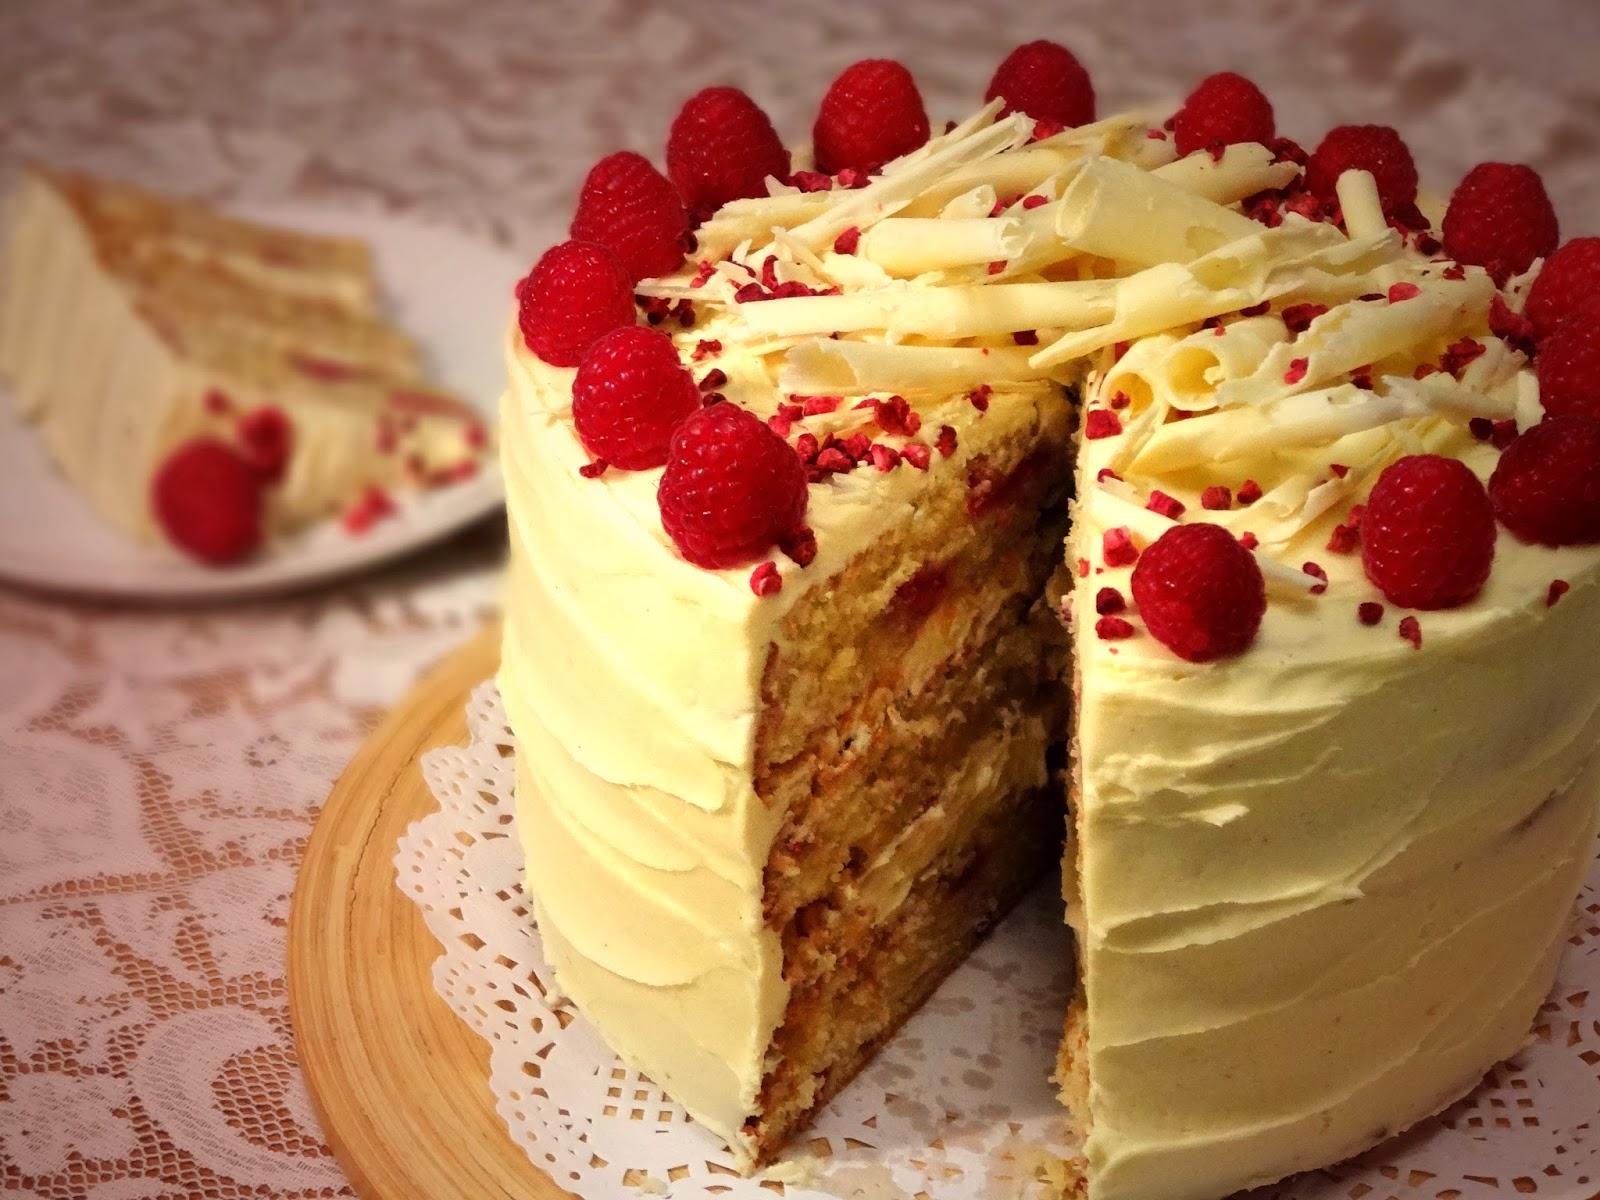 Good Food White Chocolate And Raspberry Cake